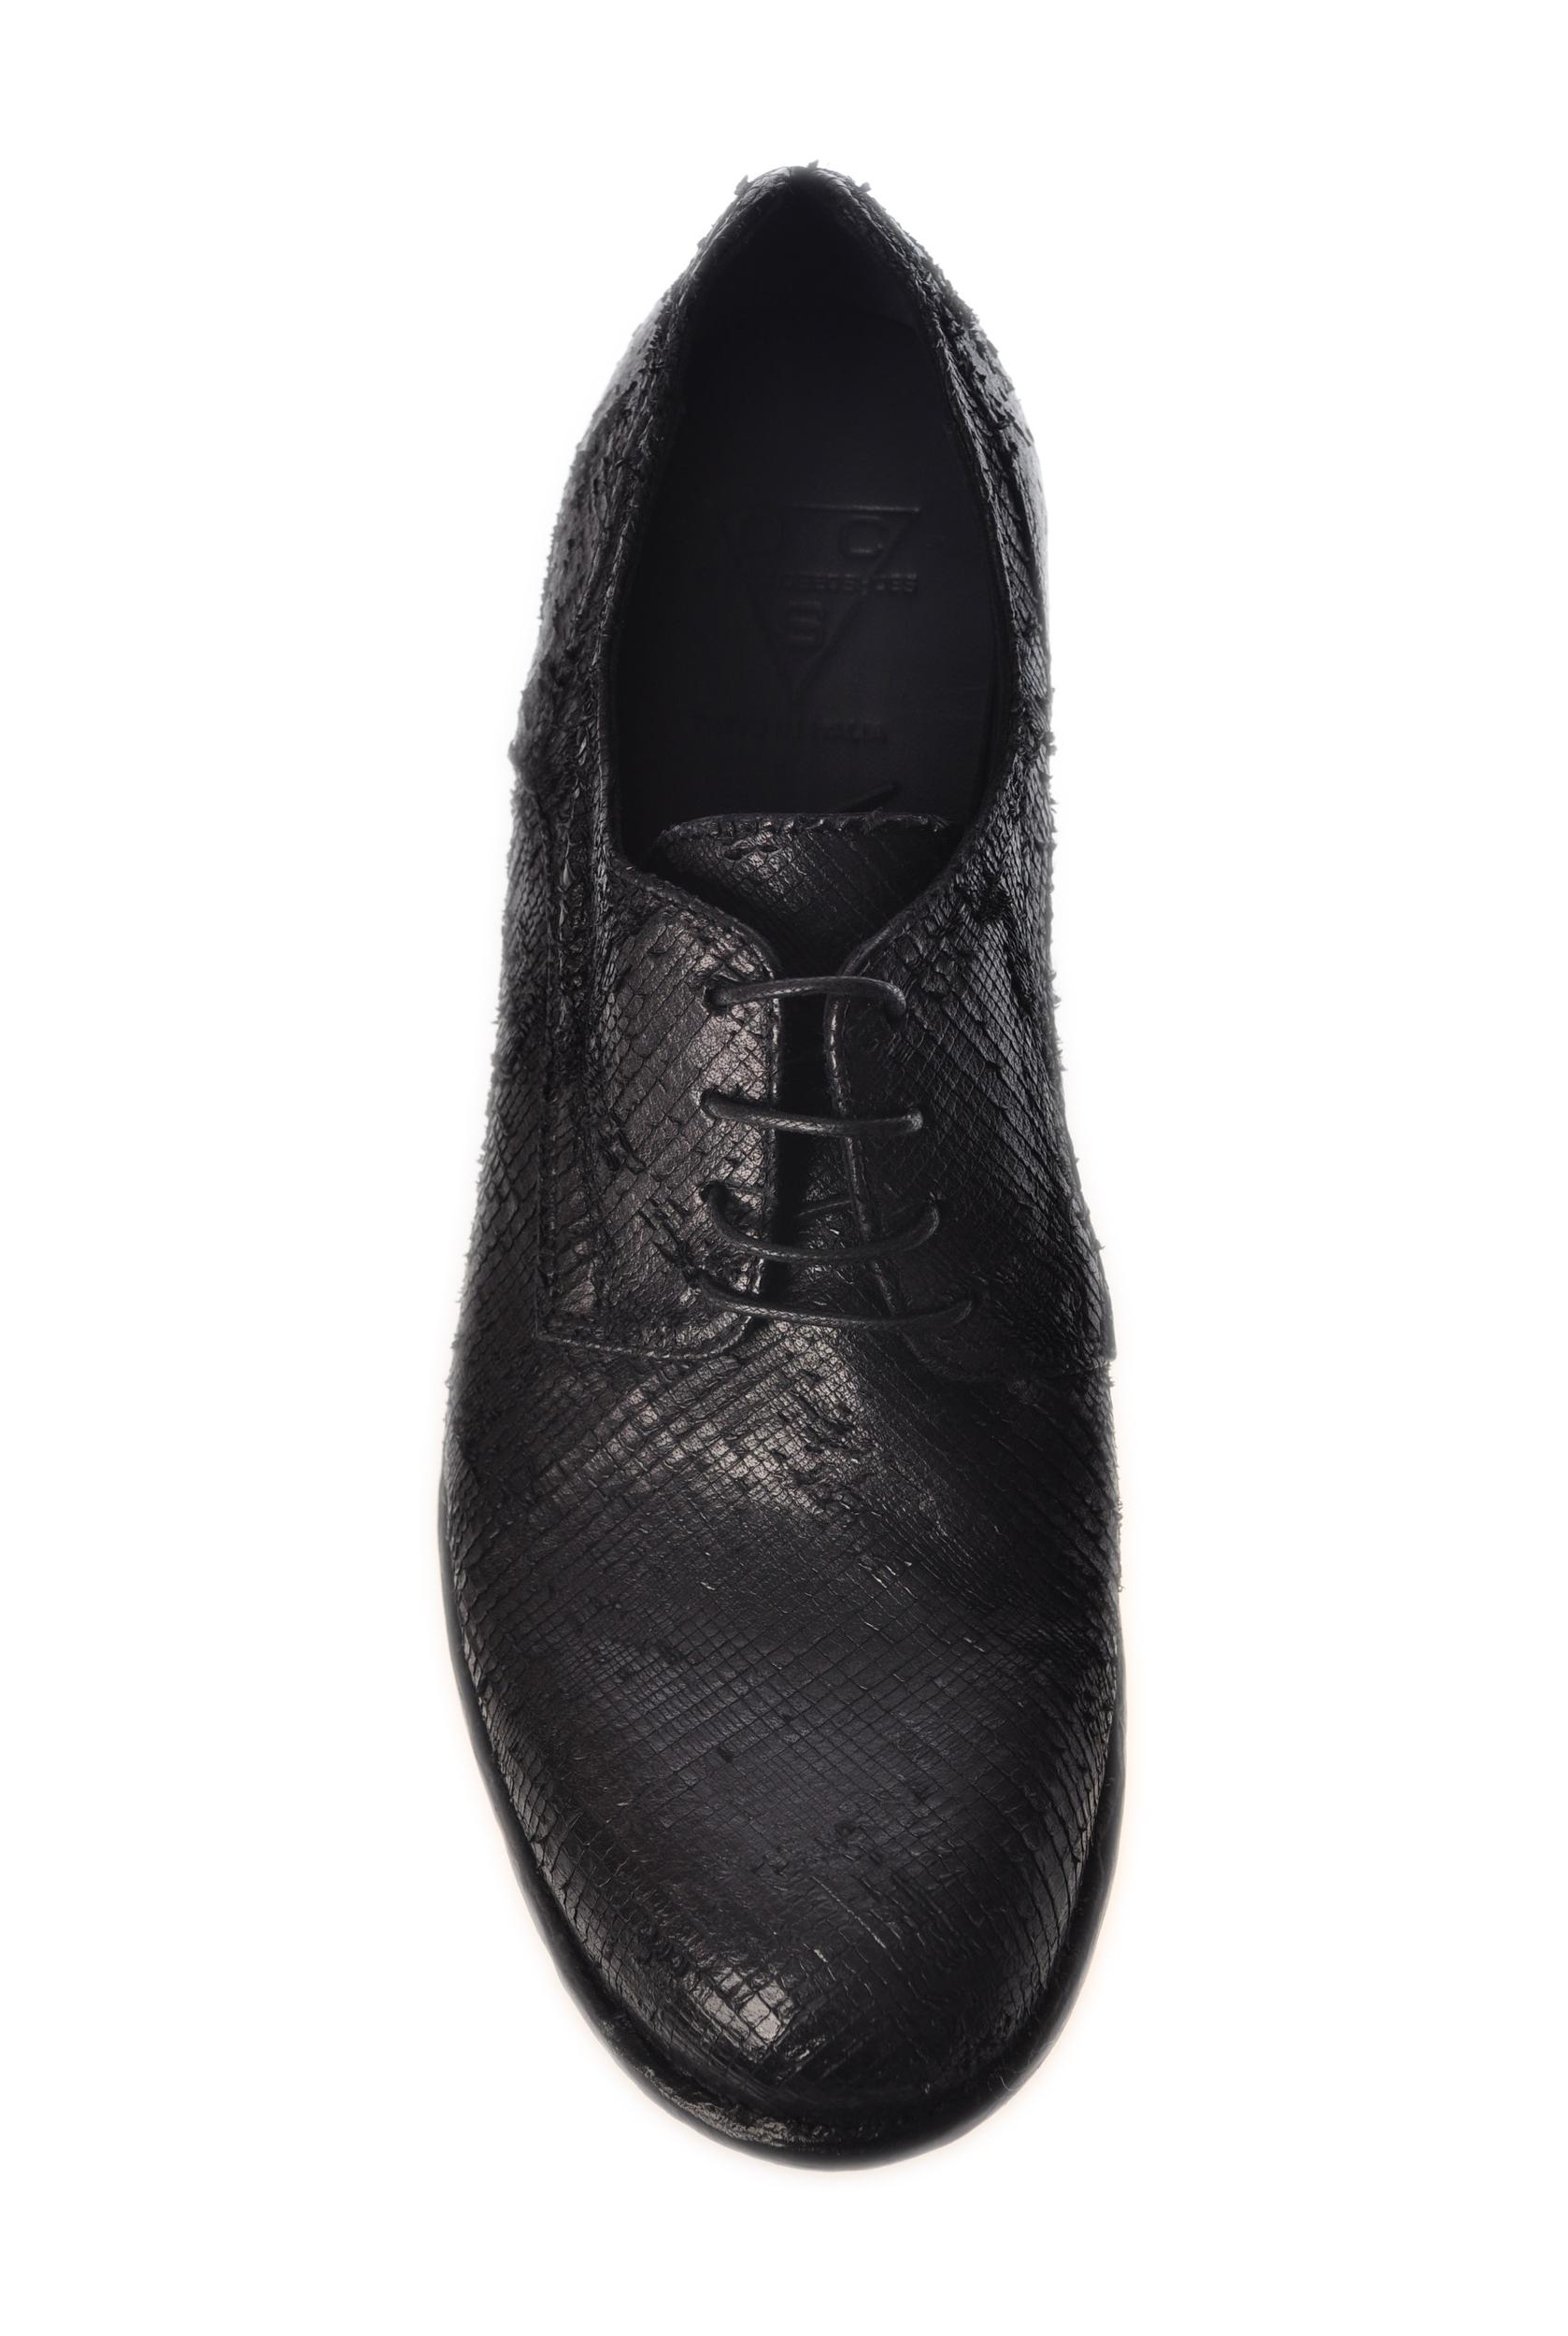 "Openclosedshoes ""5899"" Stringate"